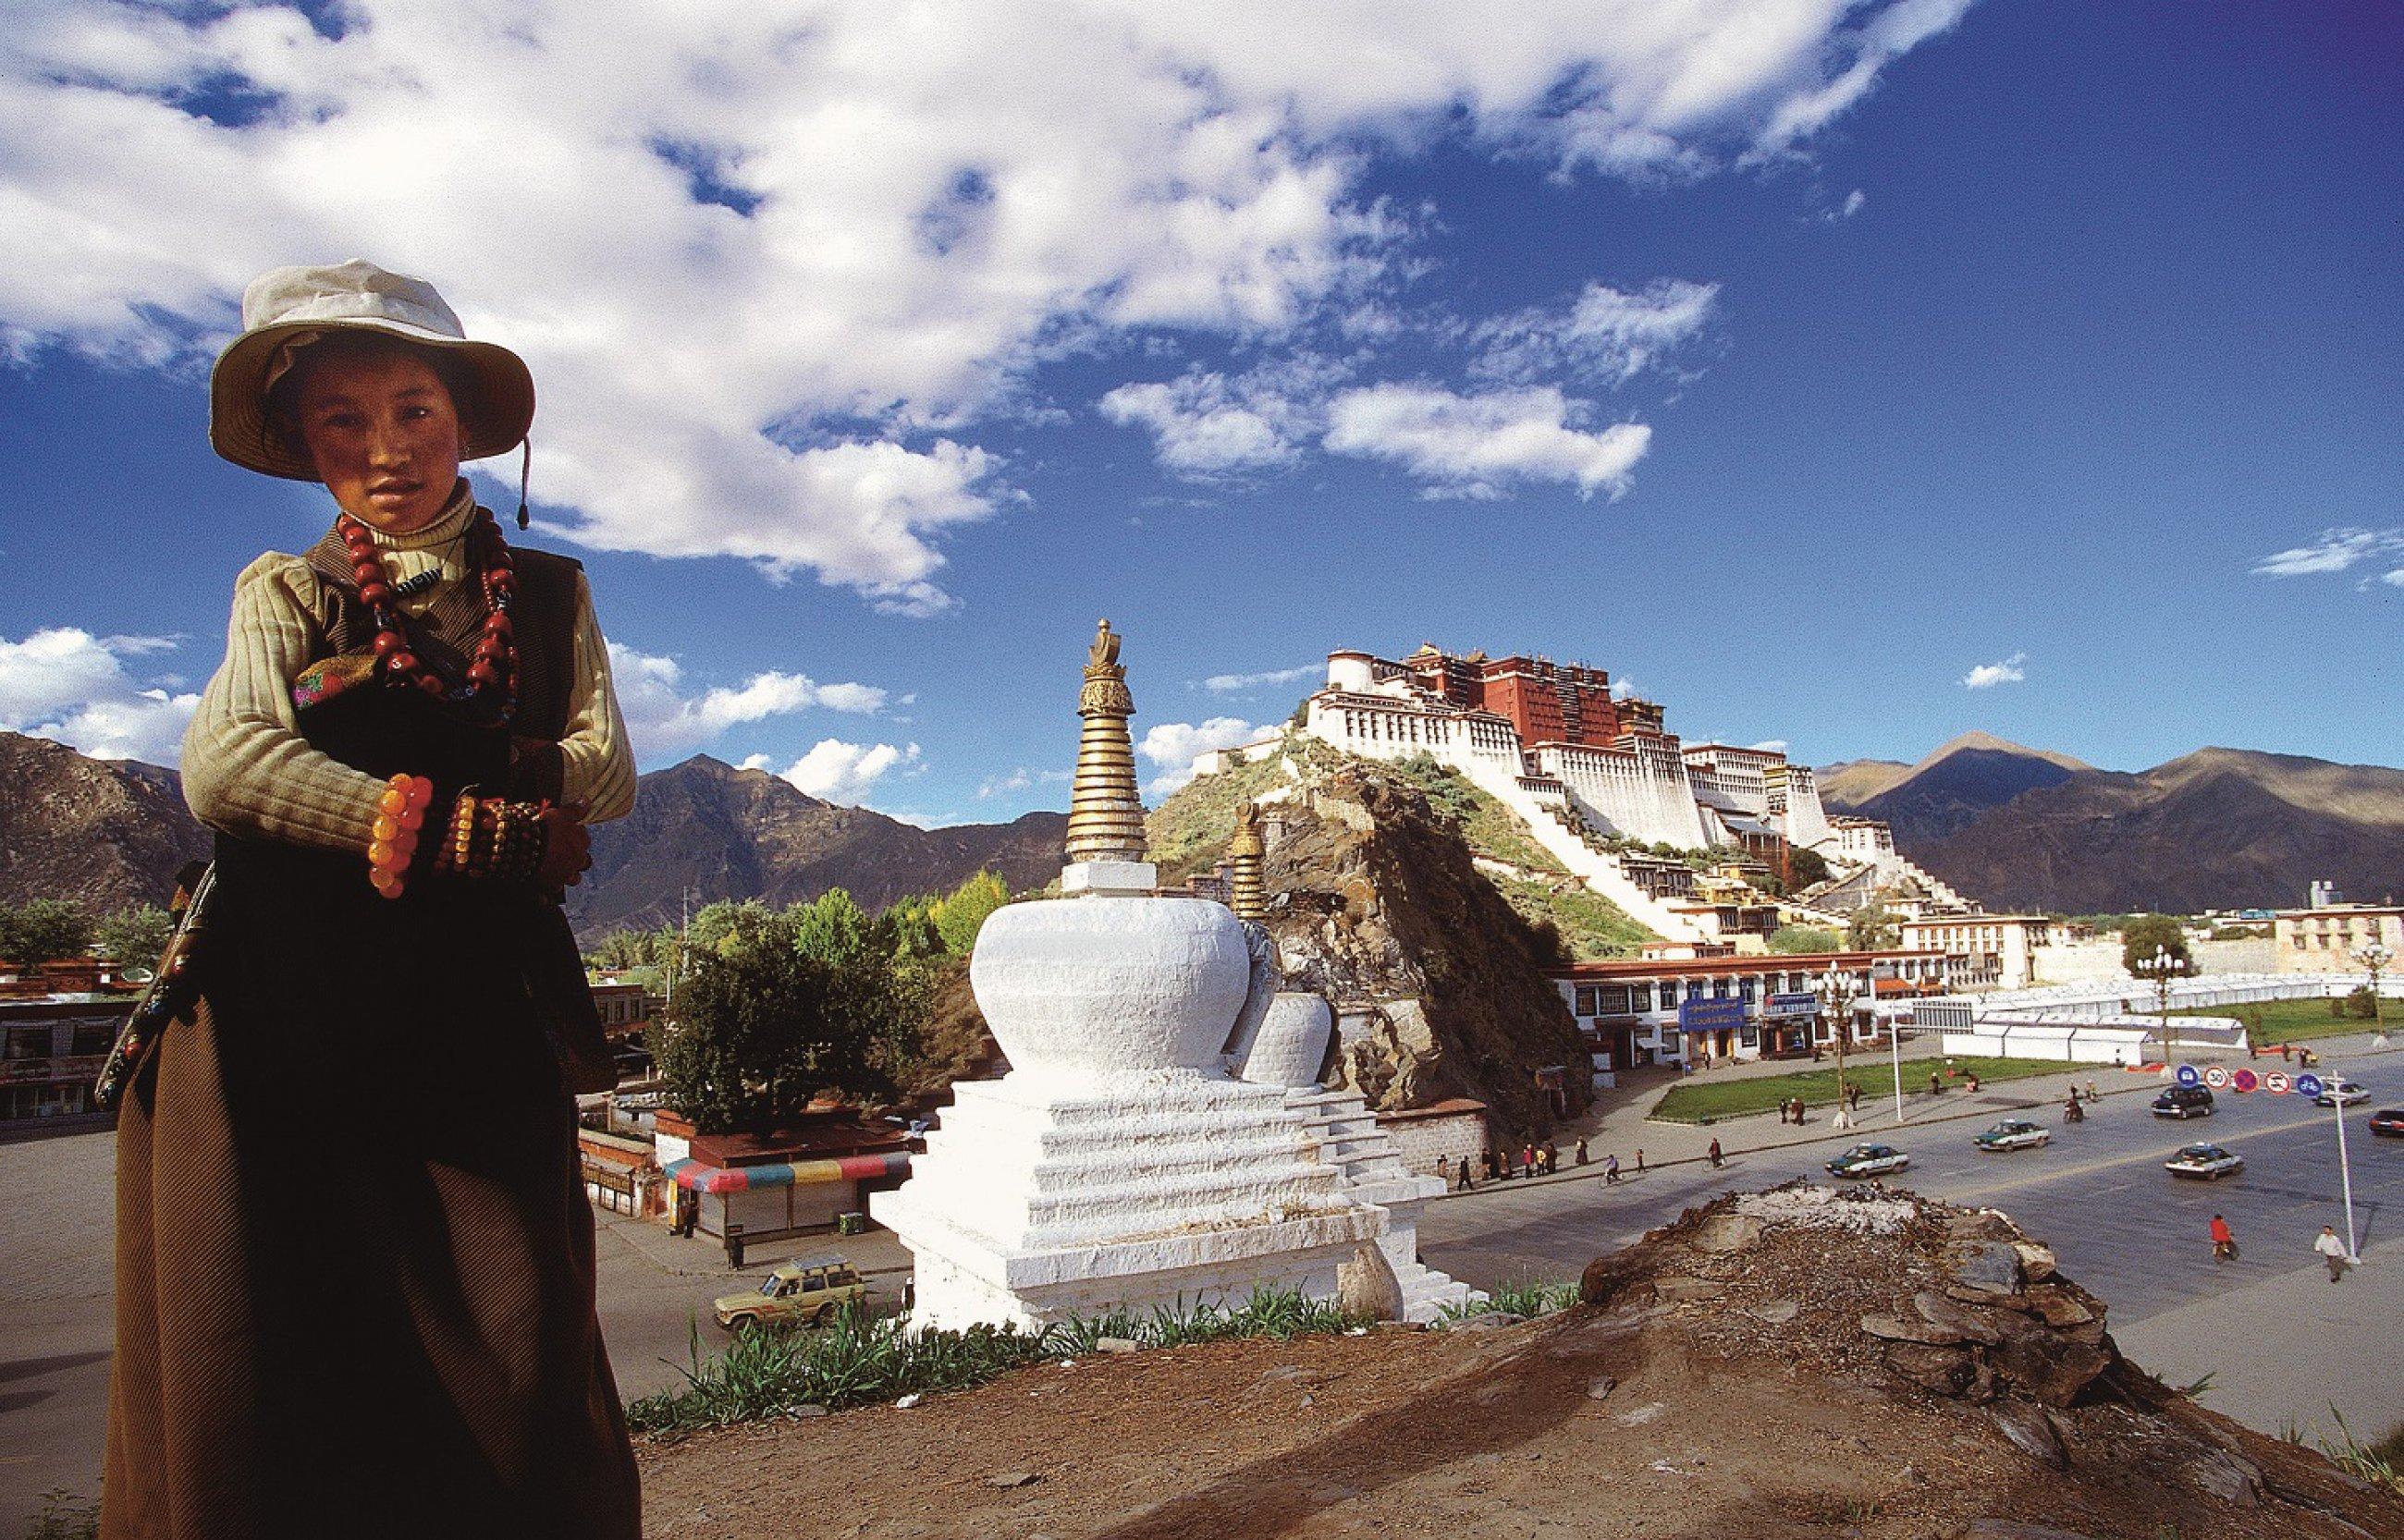 https://bubo.sk/uploads/galleries/16269/tibet-lhasa.jpg